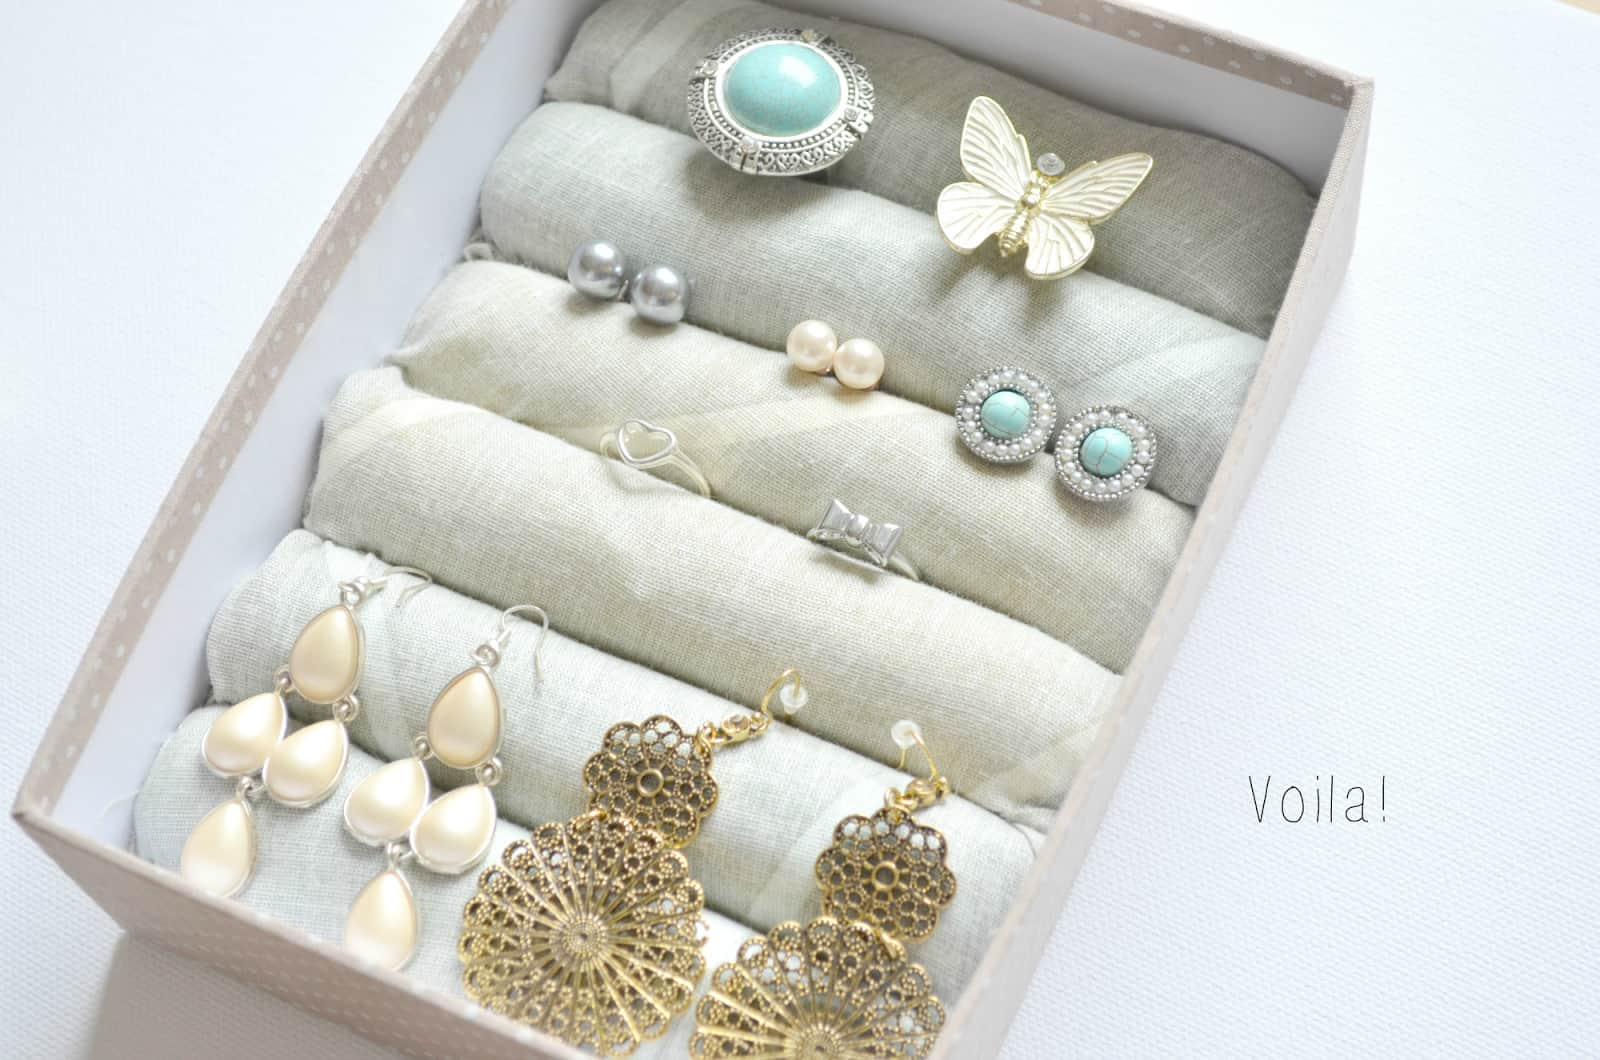 How to create easy DIY jewelry box